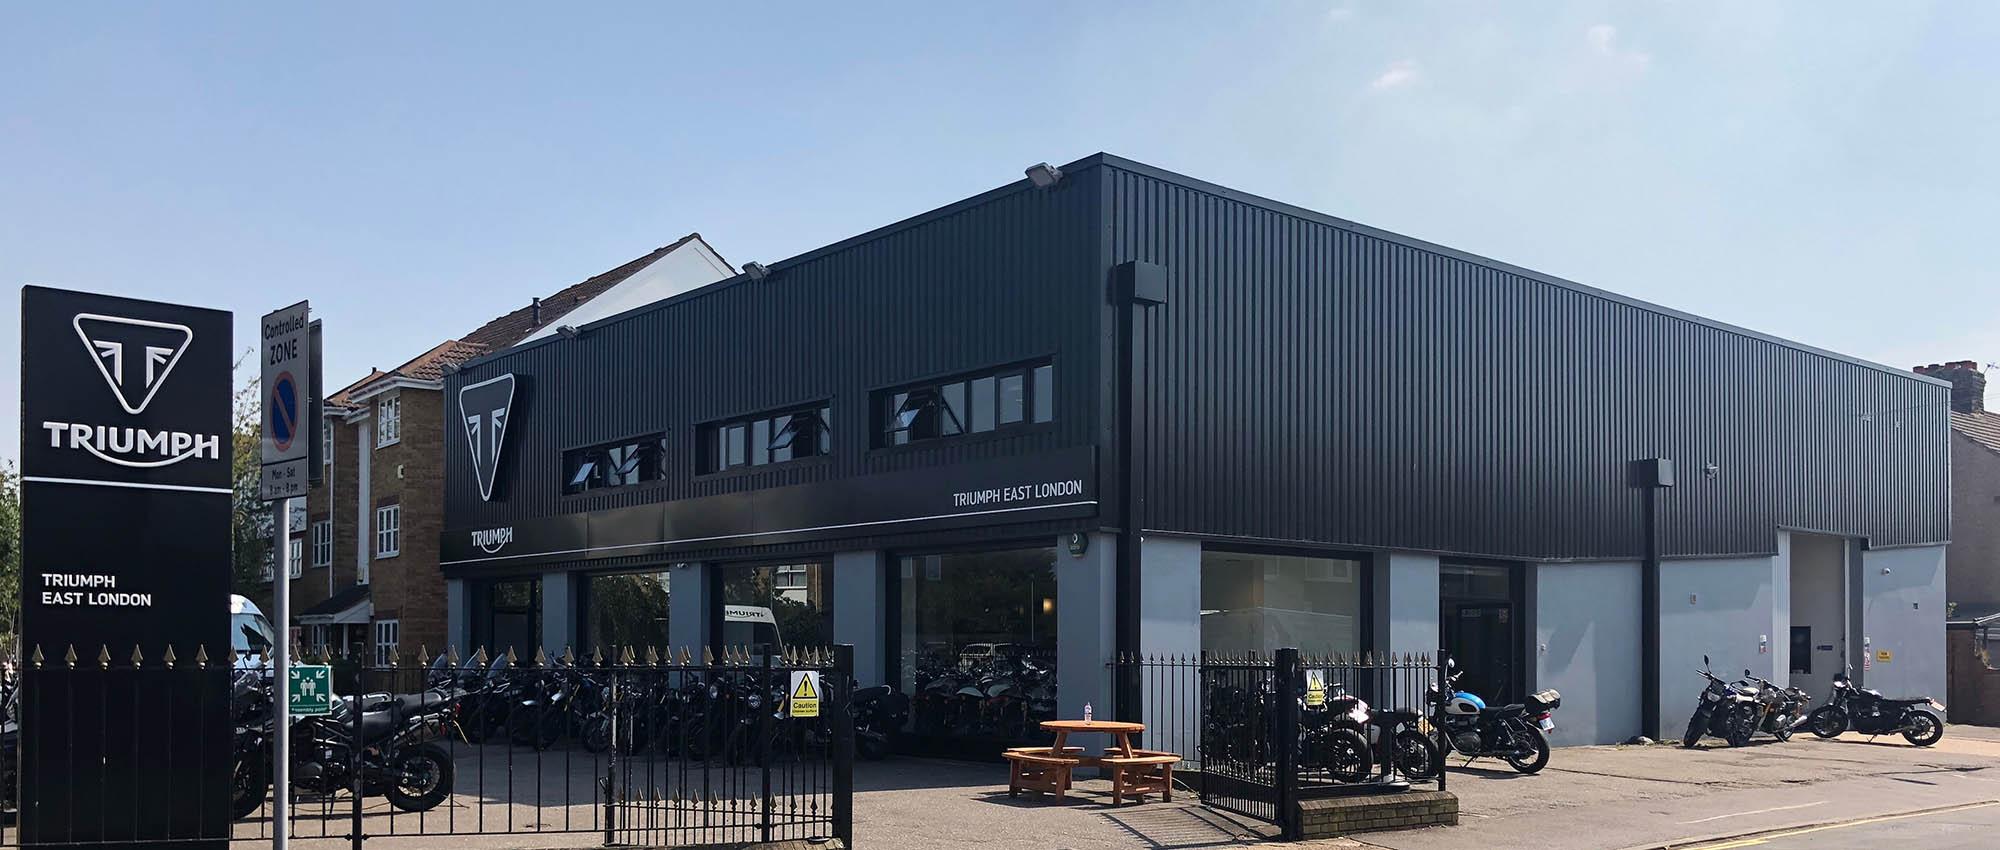 Industrial Commercial Roofing Kent Capel Cladding Ltd